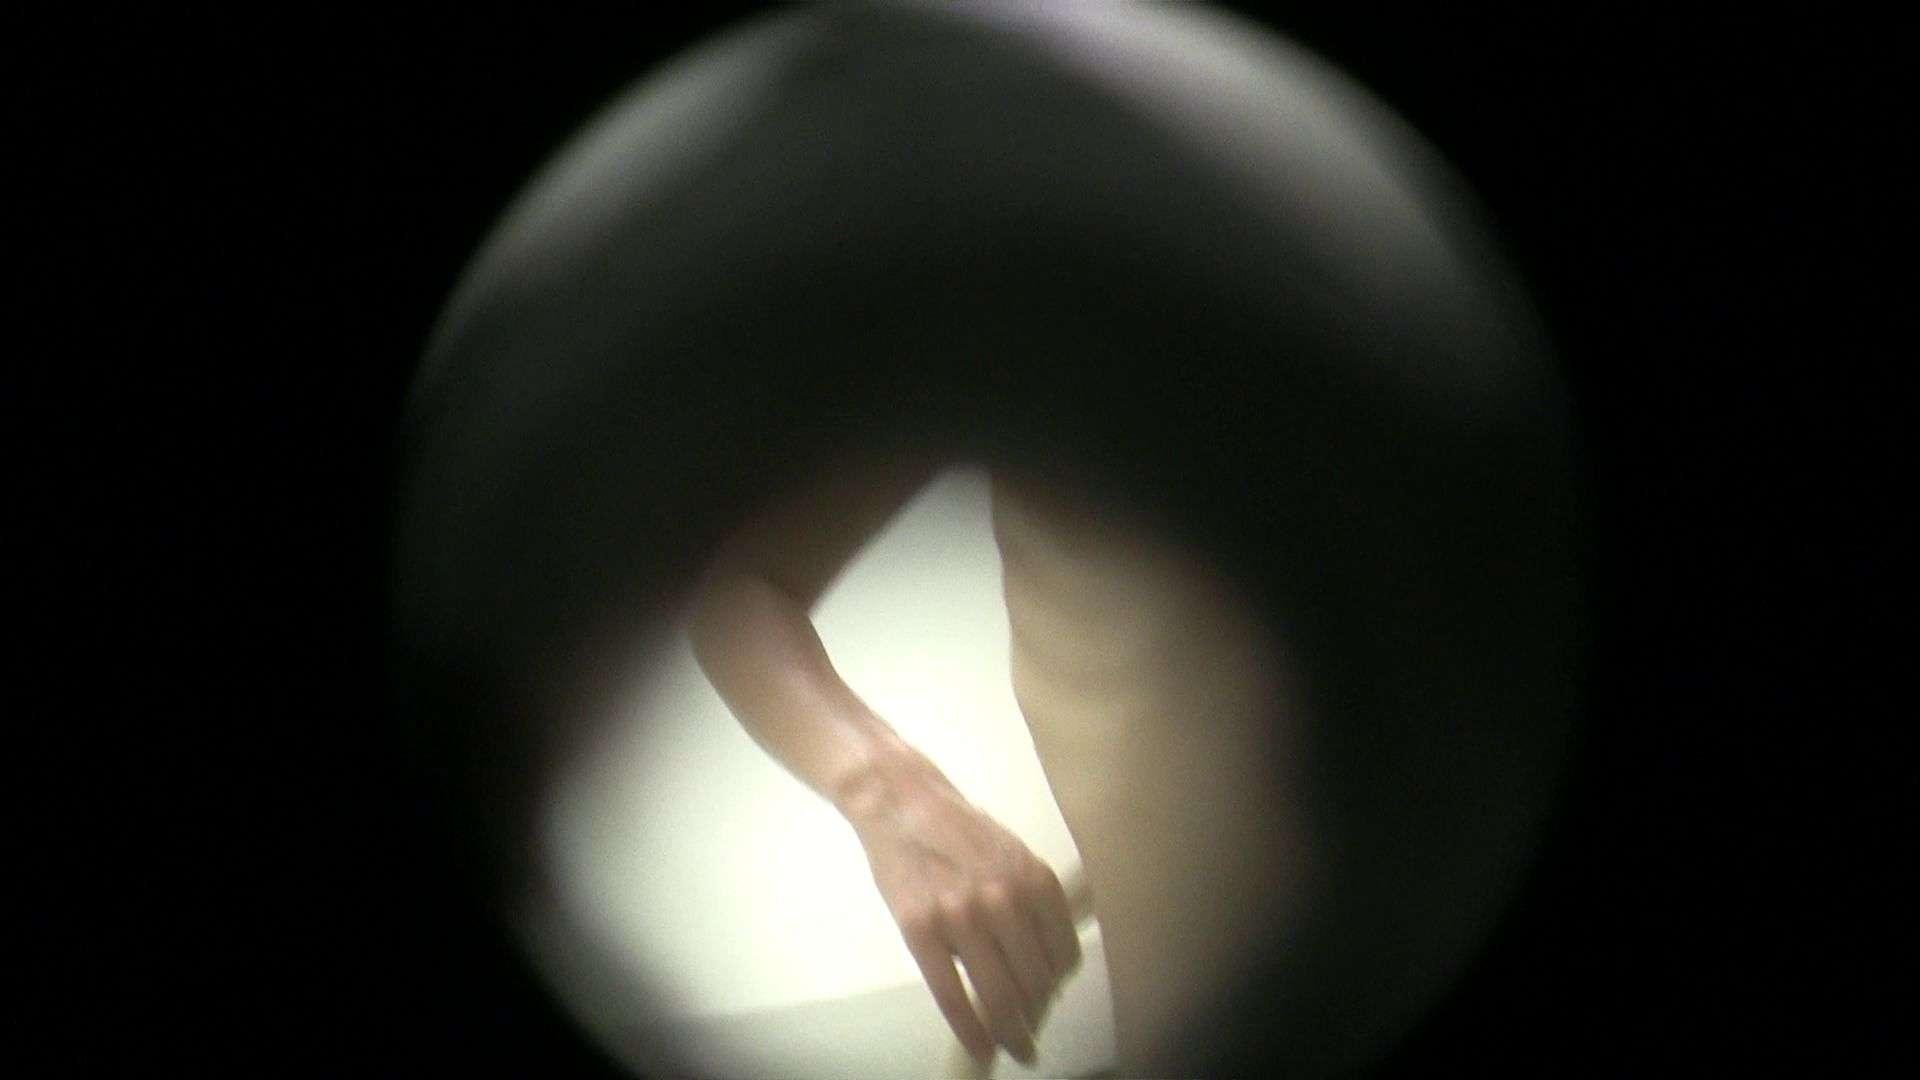 NO.35 勃起力の高い乳首を持つ年増 シャワー室 おまんこ無修正動画無料 109枚 52